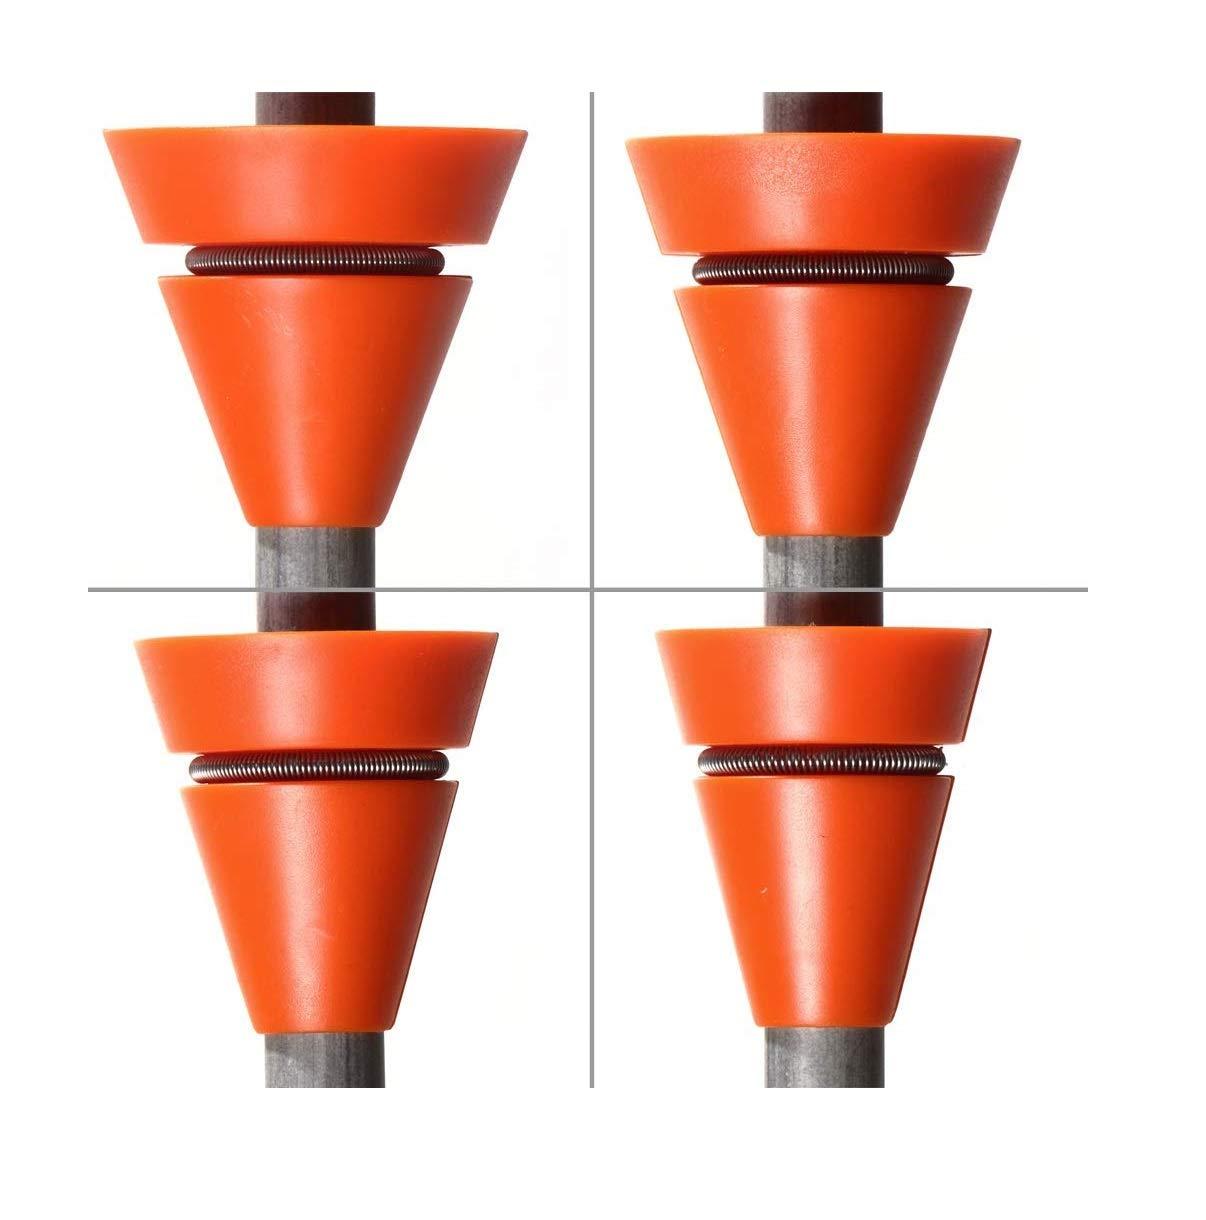 Wedgek Angle Guides 14°, 16°, 18°, 20° for Sharpening Knife on Honing Steel Ceramic or Diamond Rod - Orange